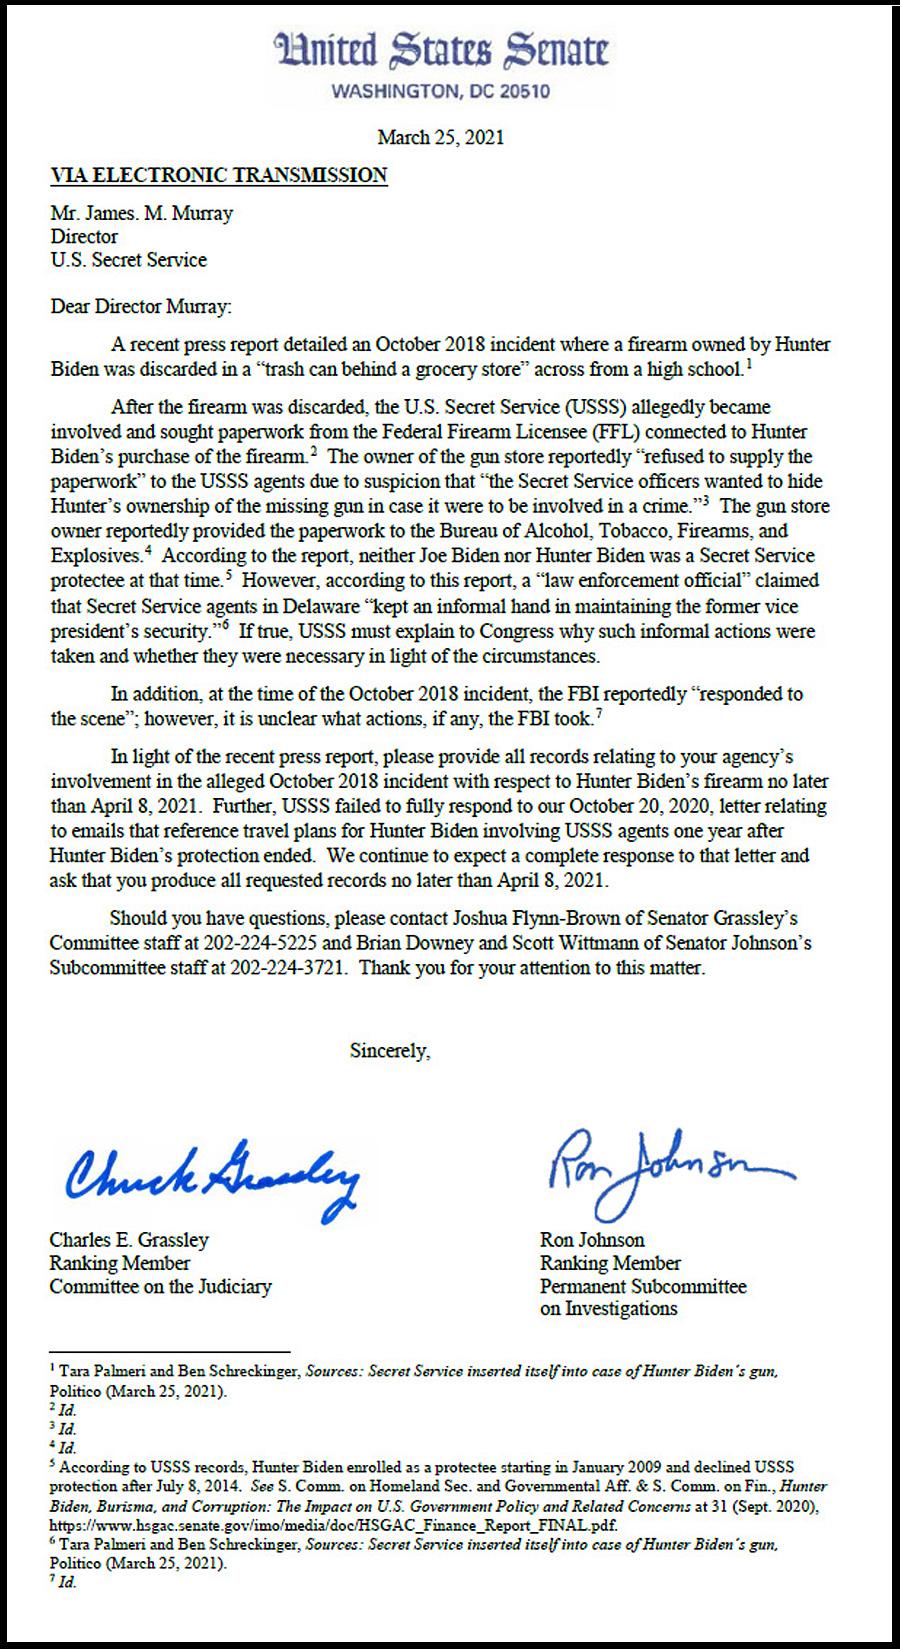 Full text of the senators' letter to the Secret Service